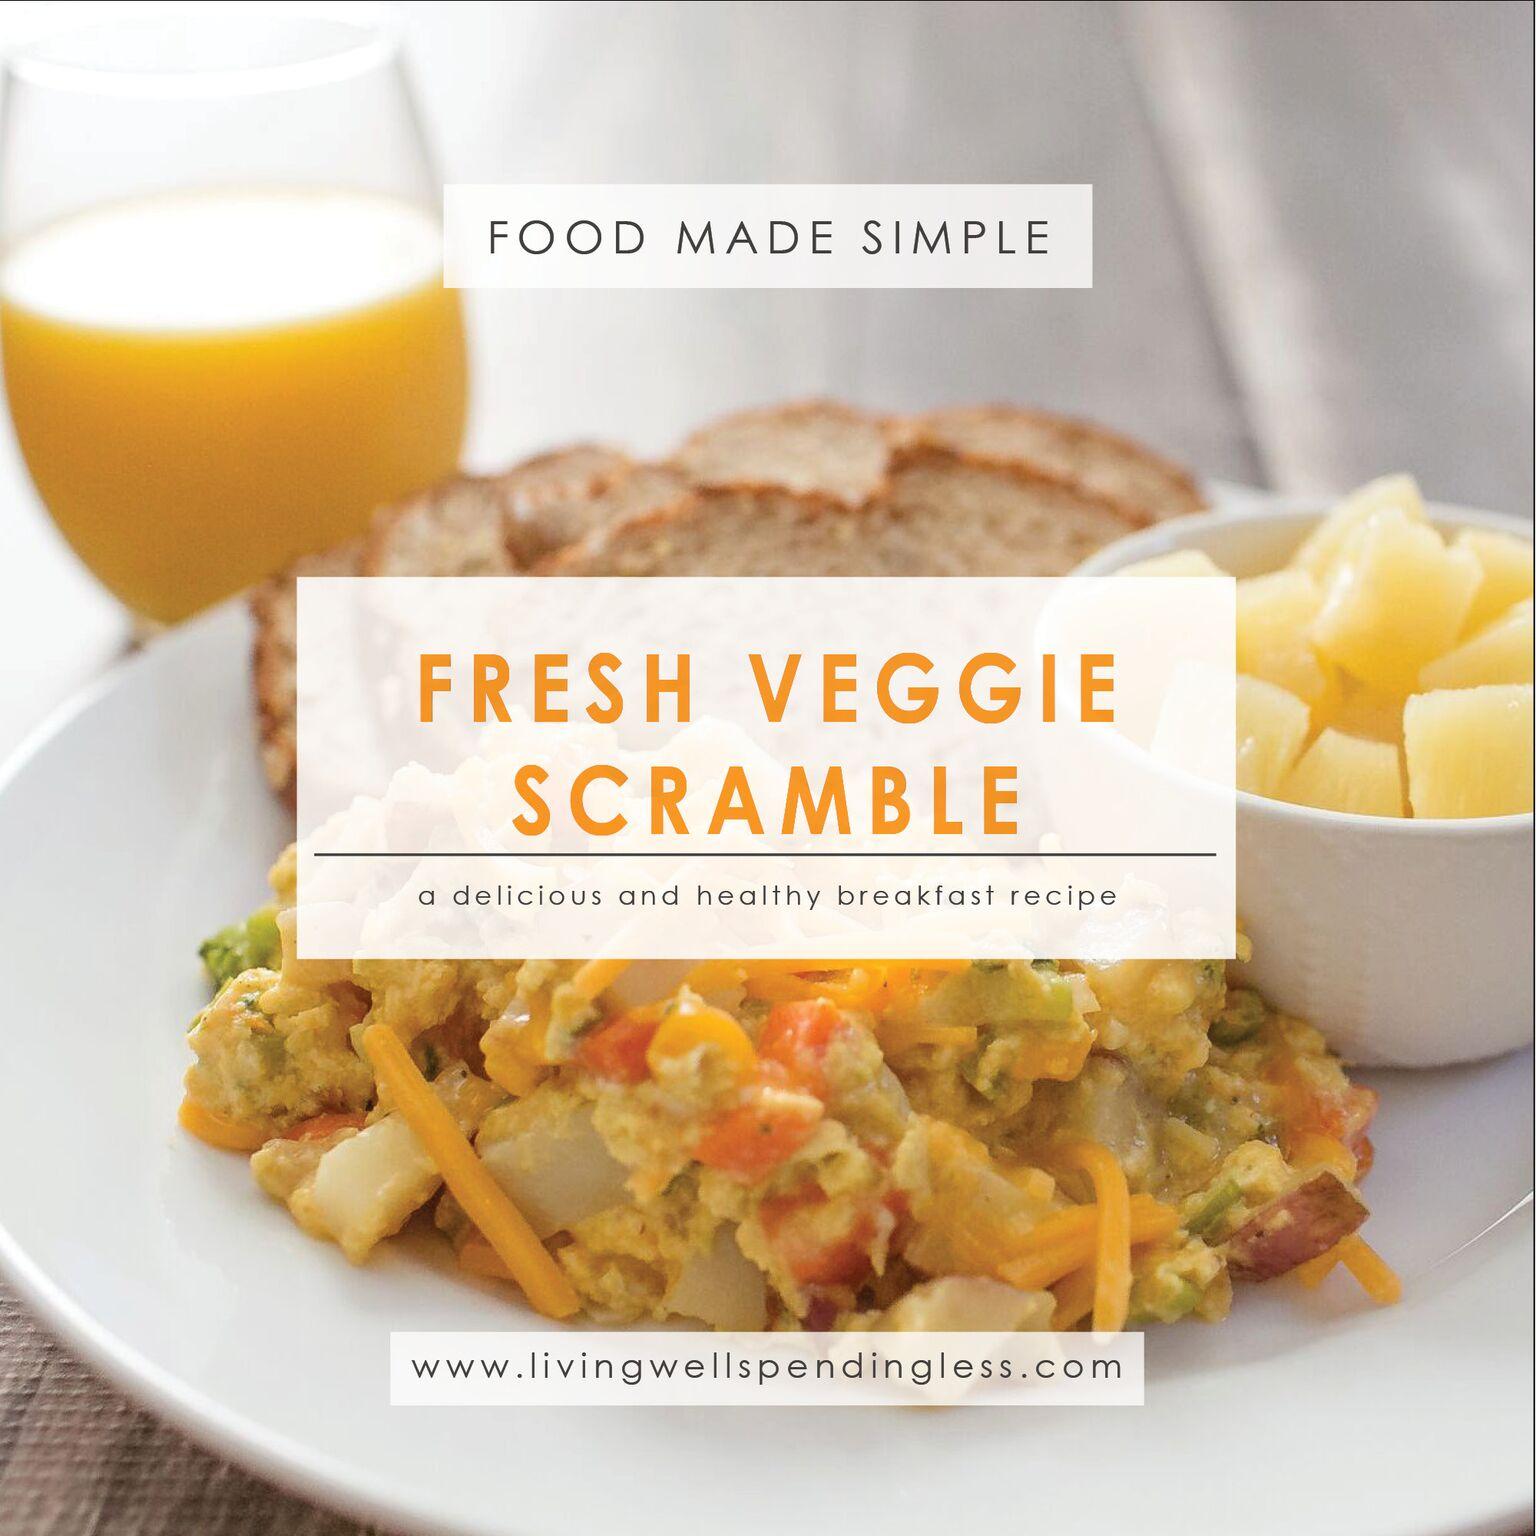 Fresh Veggie ScrambleFast And Healthy Breakfast RecipeEgg RecipeBreakfast Food